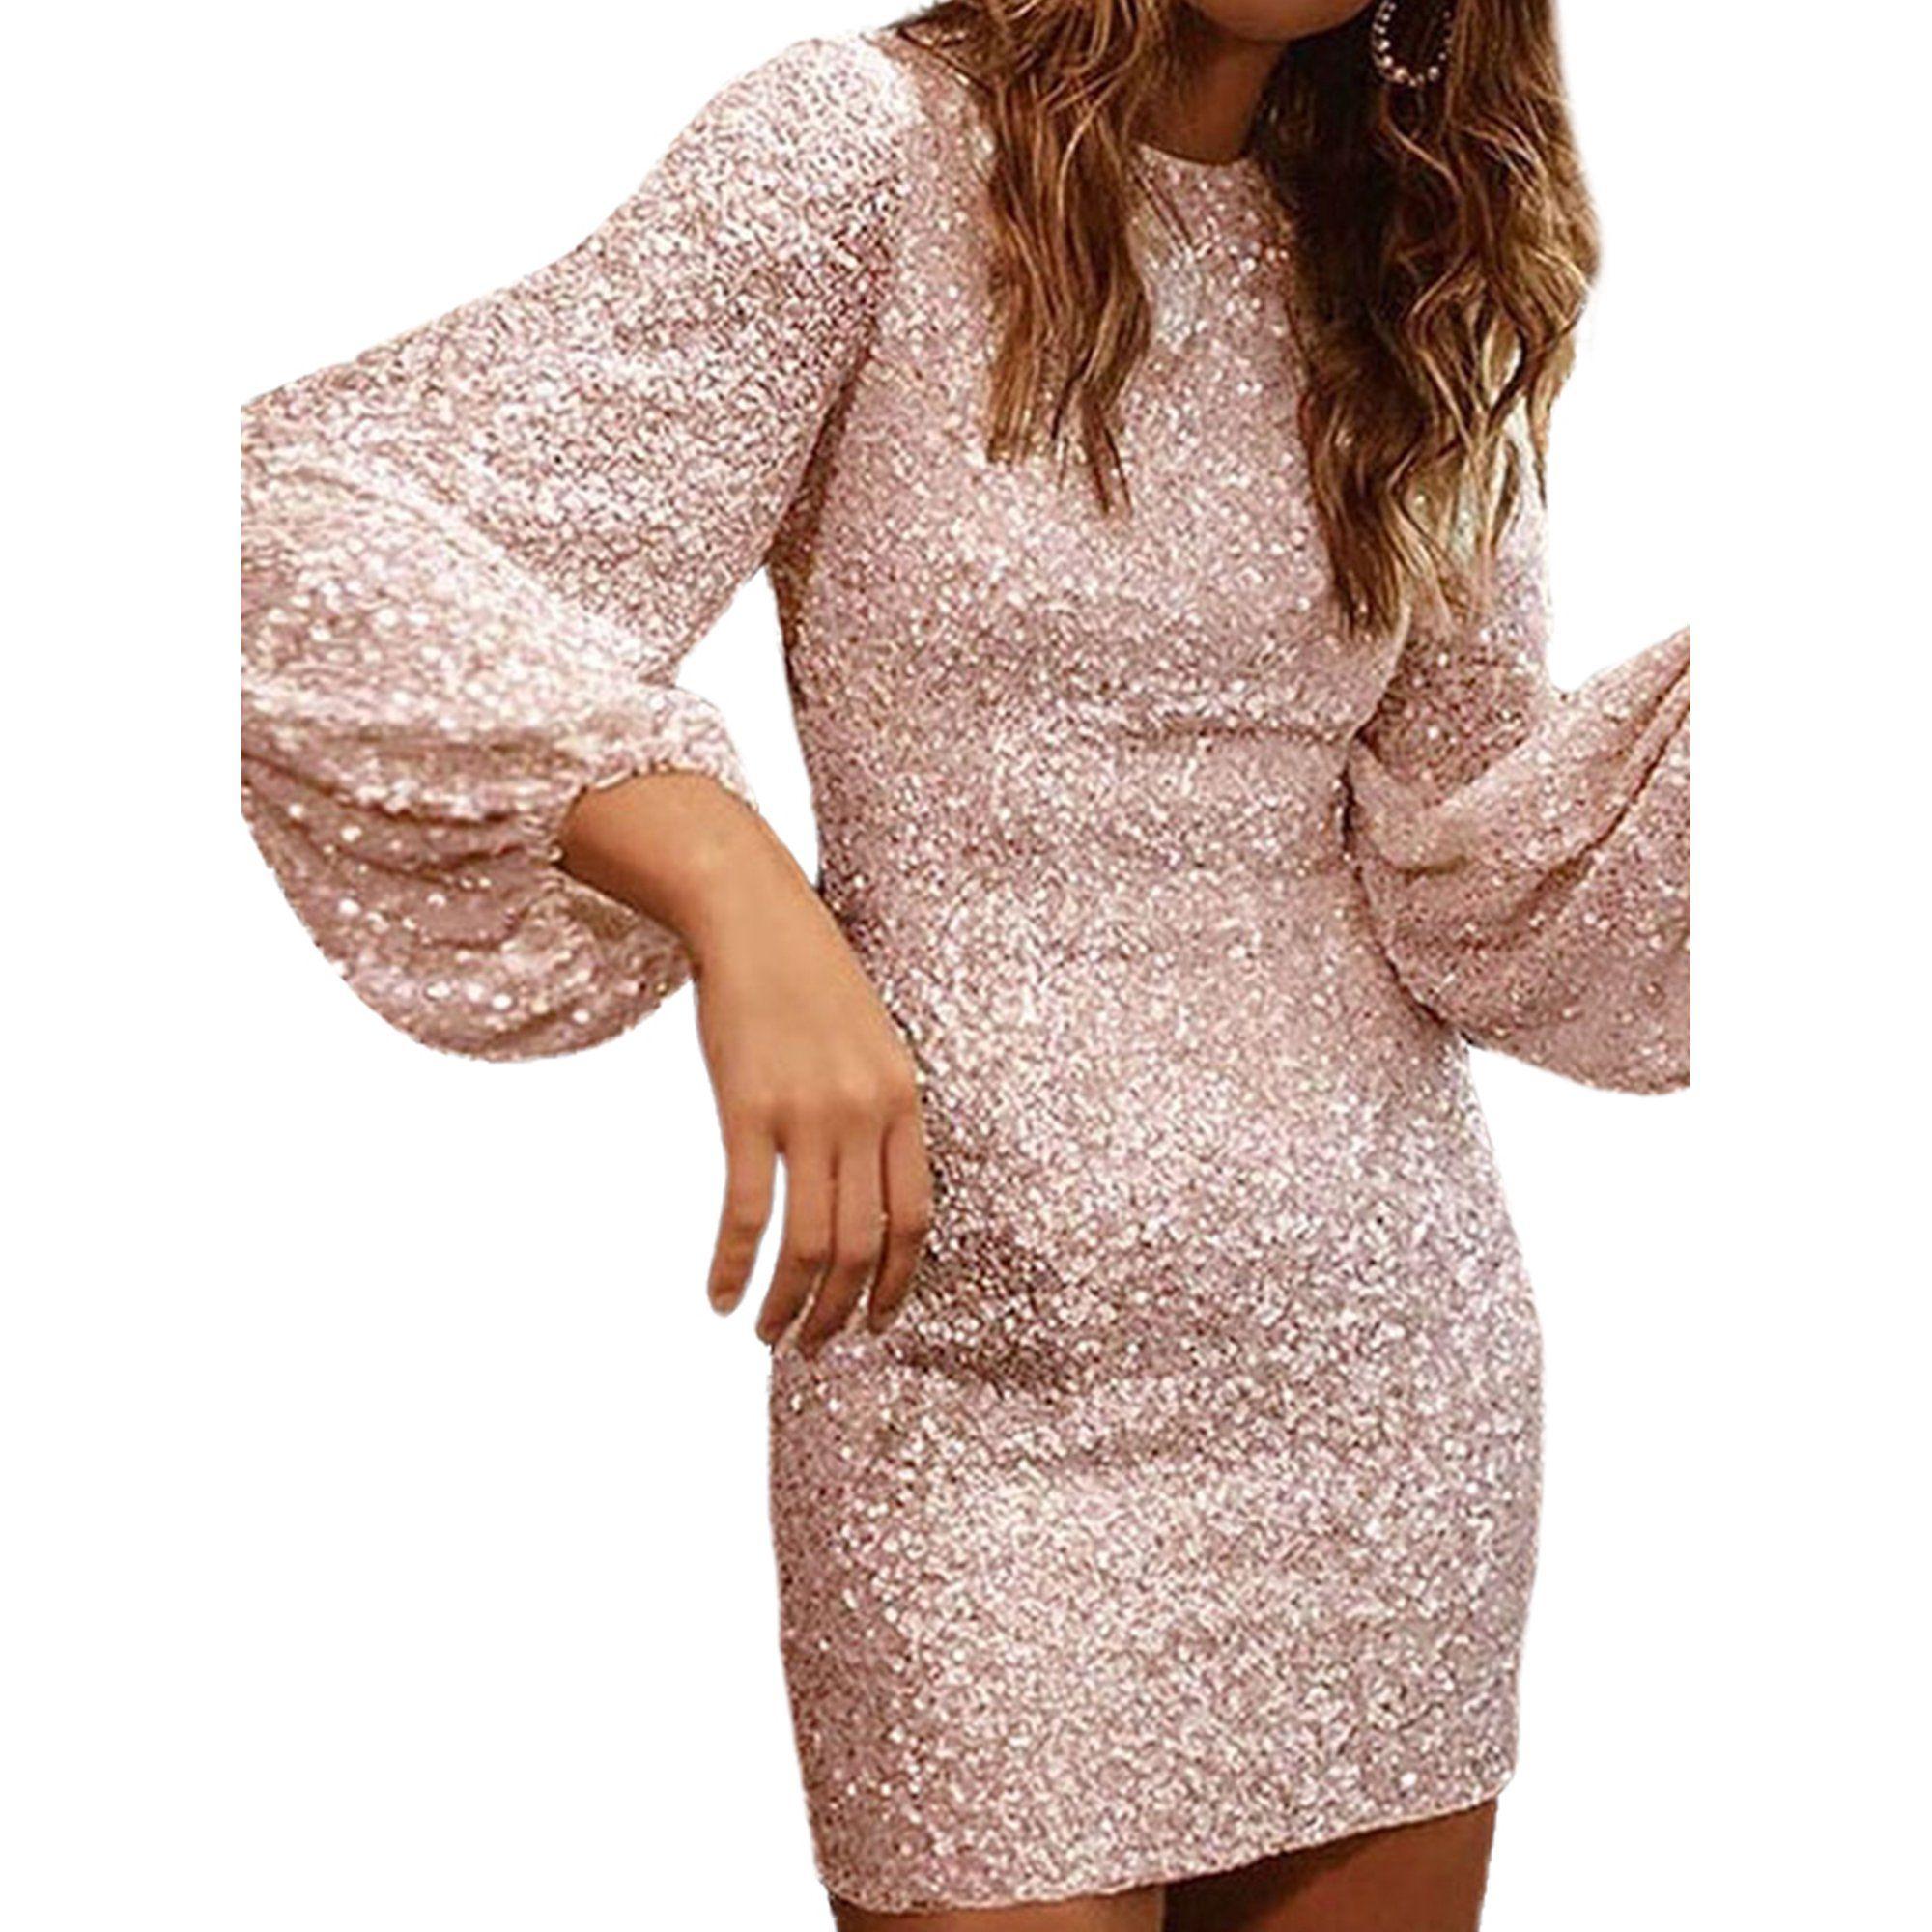 Lallc Women S Sequins Bodycon Long Sleeve Evening Party Cocktail Prom Mini Dress Walmart Com In 2021 Women S A Line Dresses Short Mini Dress White Mini Dress [ 2000 x 2000 Pixel ]